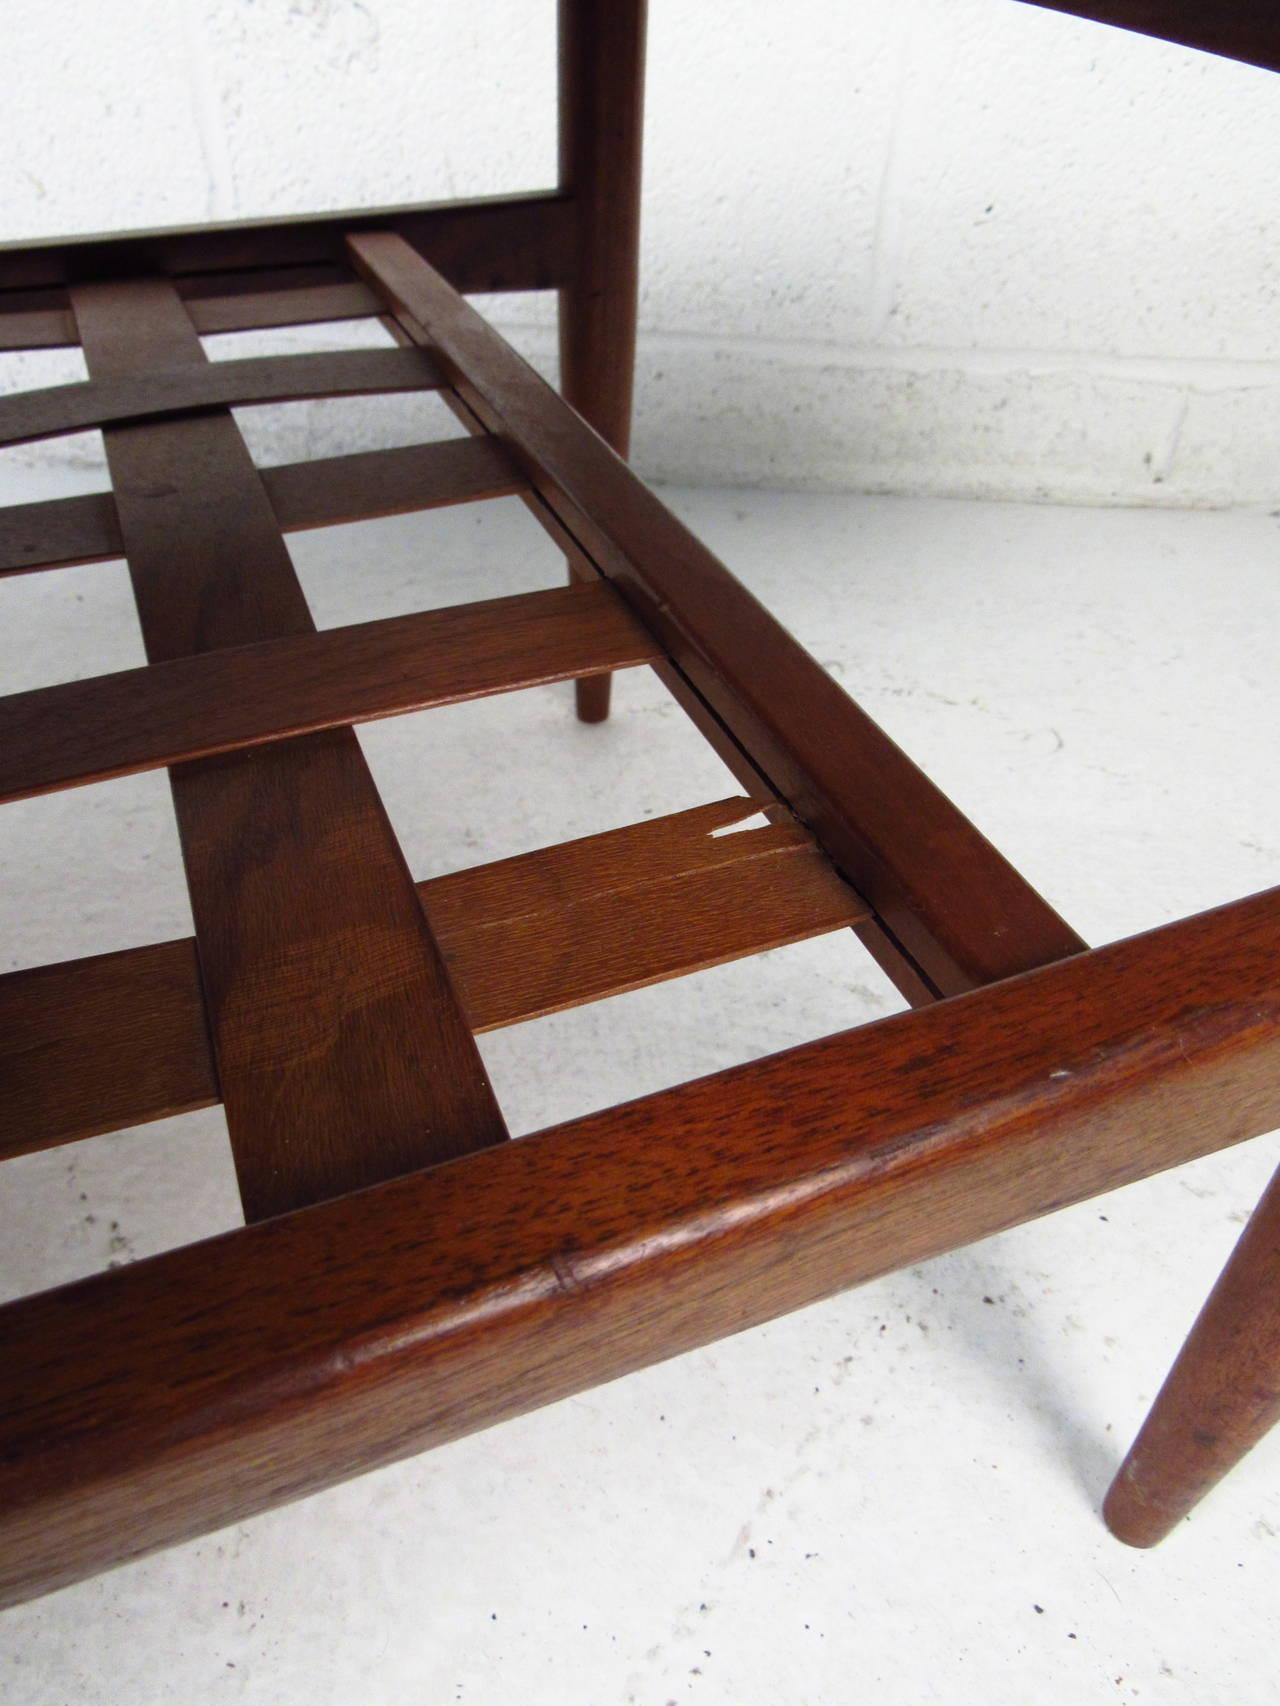 Scandinavian Modern Surfboard Coffee Table With Shelf For Sale 3